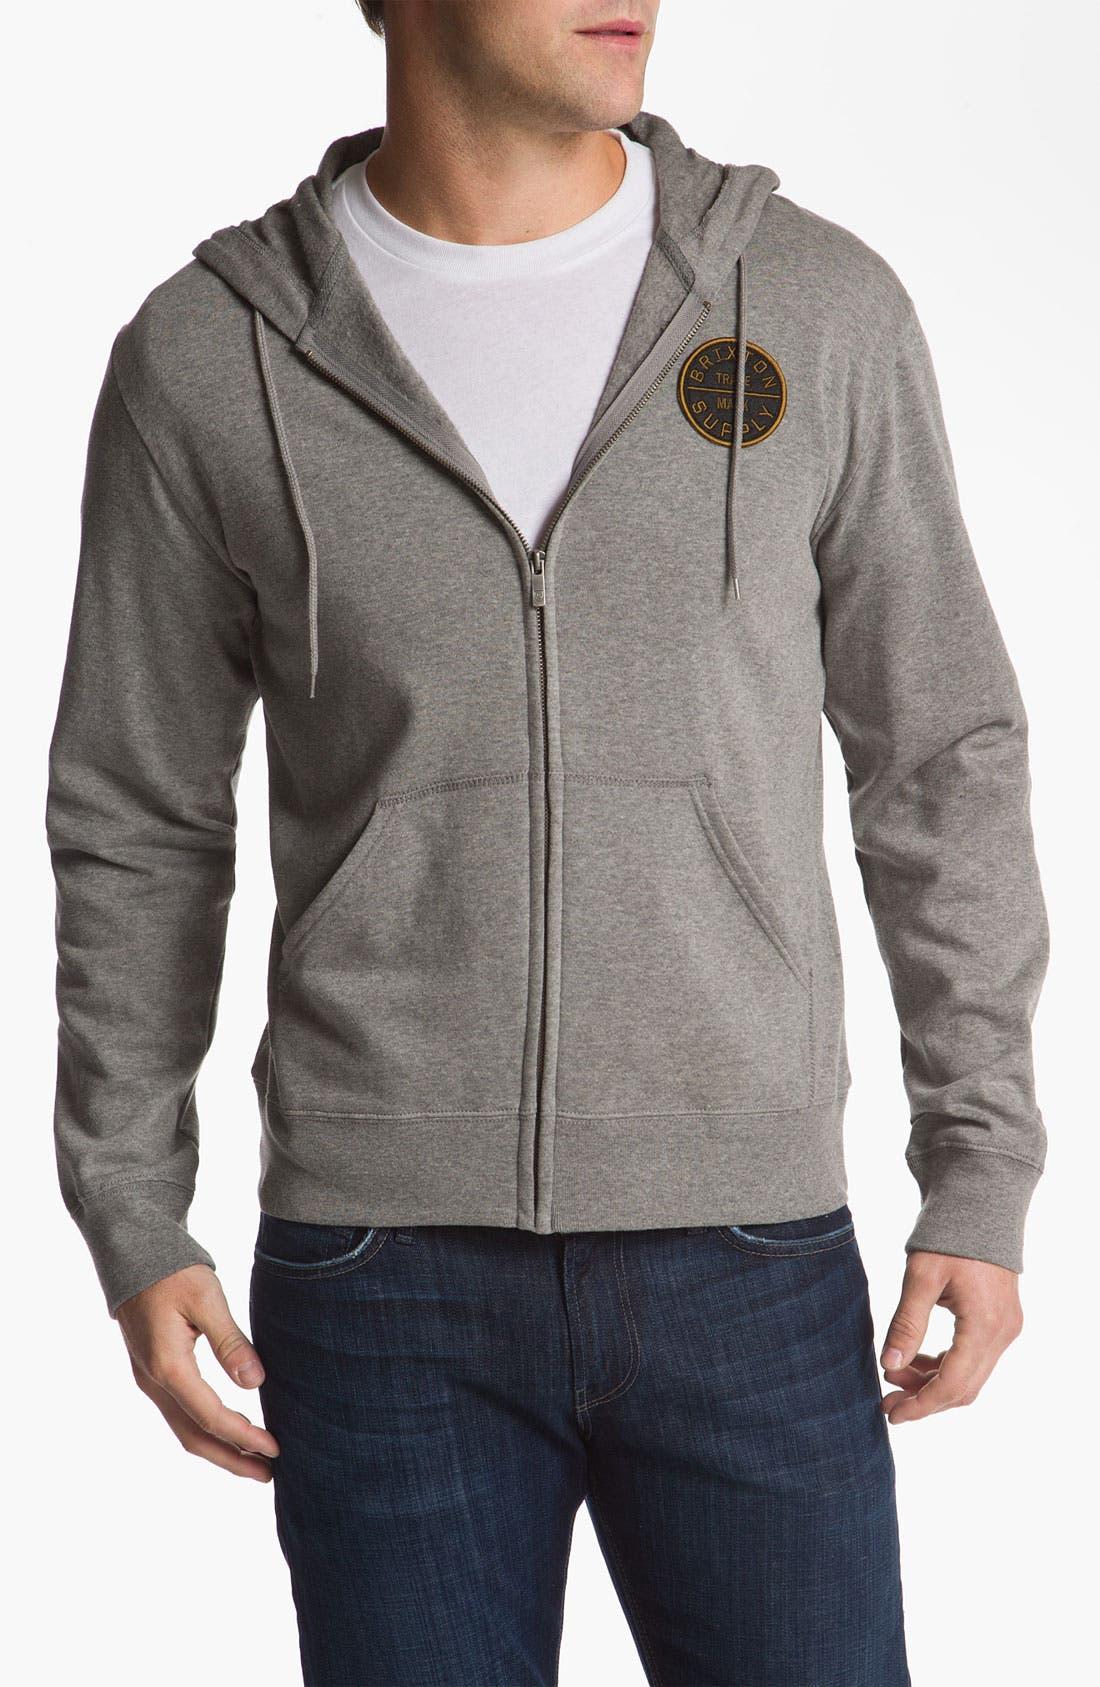 Main Image - Brixton 'Civil' Hooded Zip Front Sweatshirt